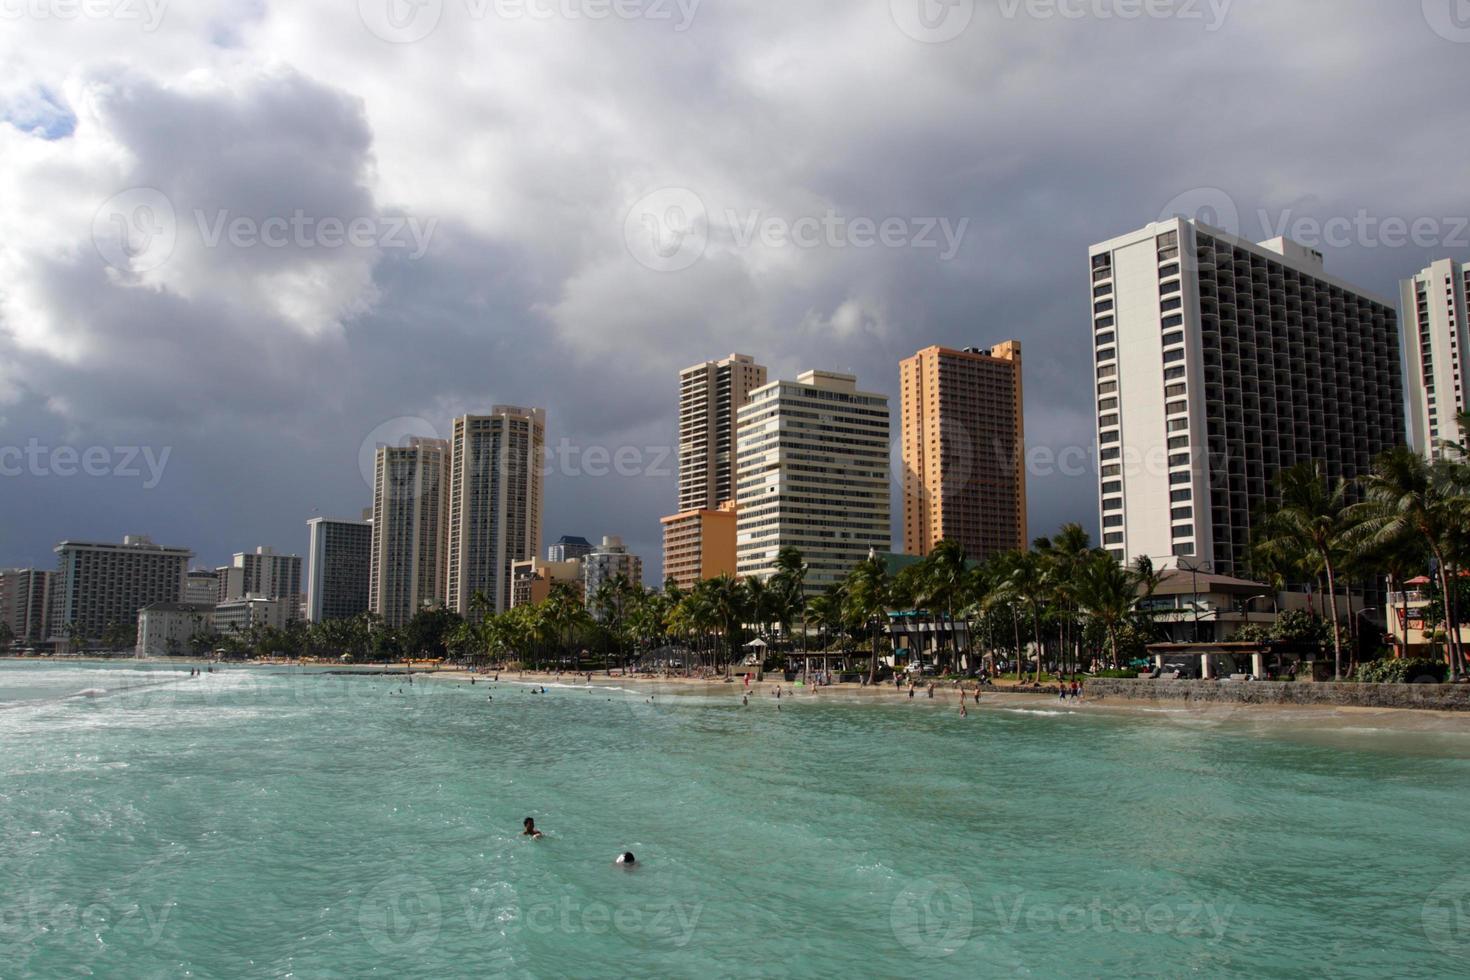 Waikiki Beach, Honolulu, Oahu, Hawaii photo